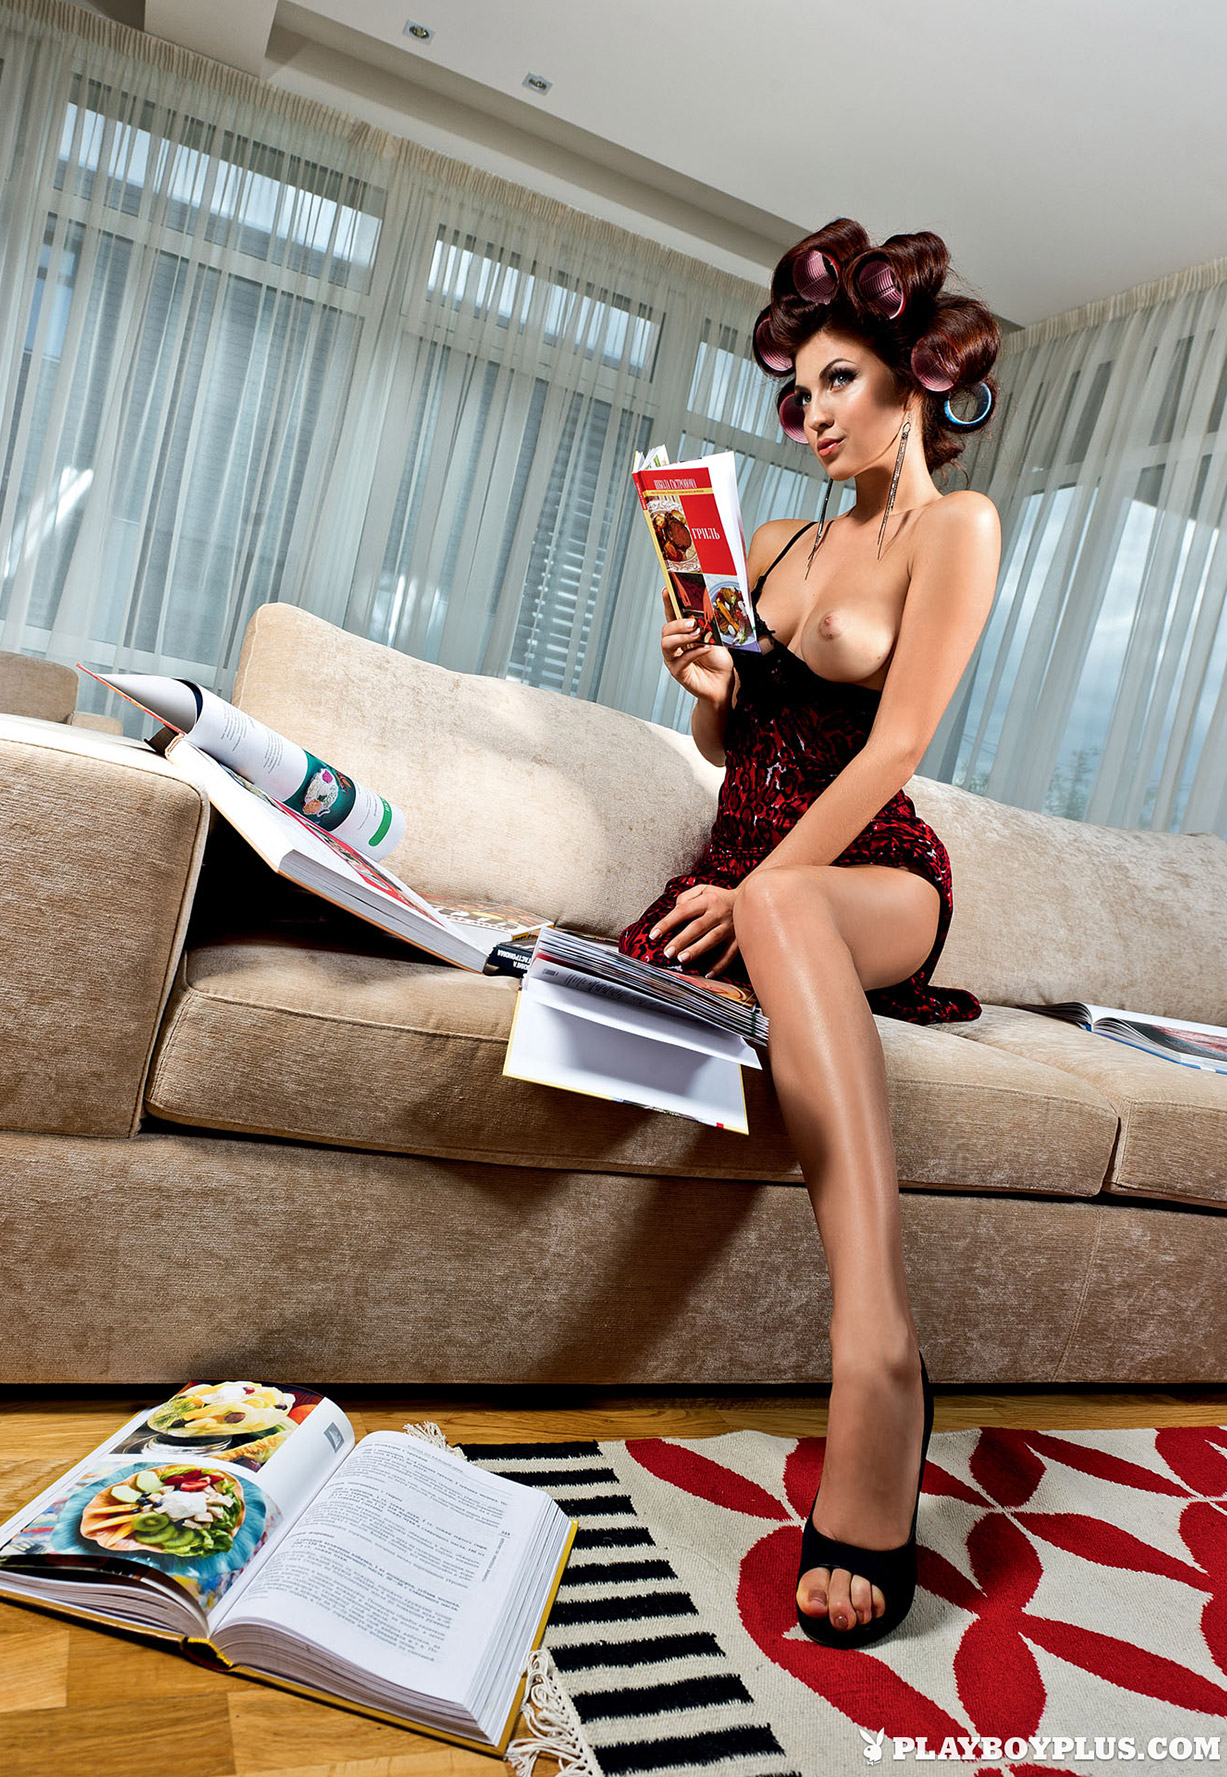 Девушка месяца Даша Петухова / Daria Petukhova - Playboy Russia november 2012 Playmate